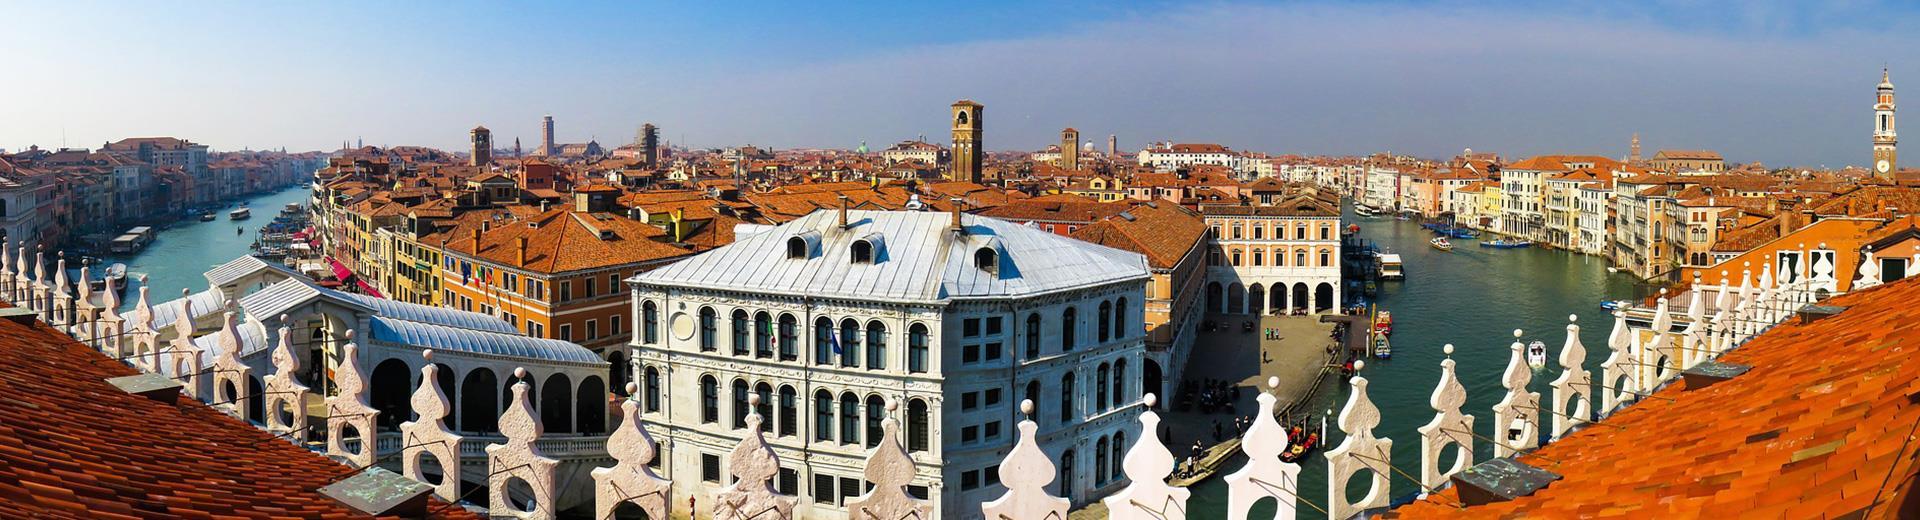 Hotel Venezia Mestre  Stelle